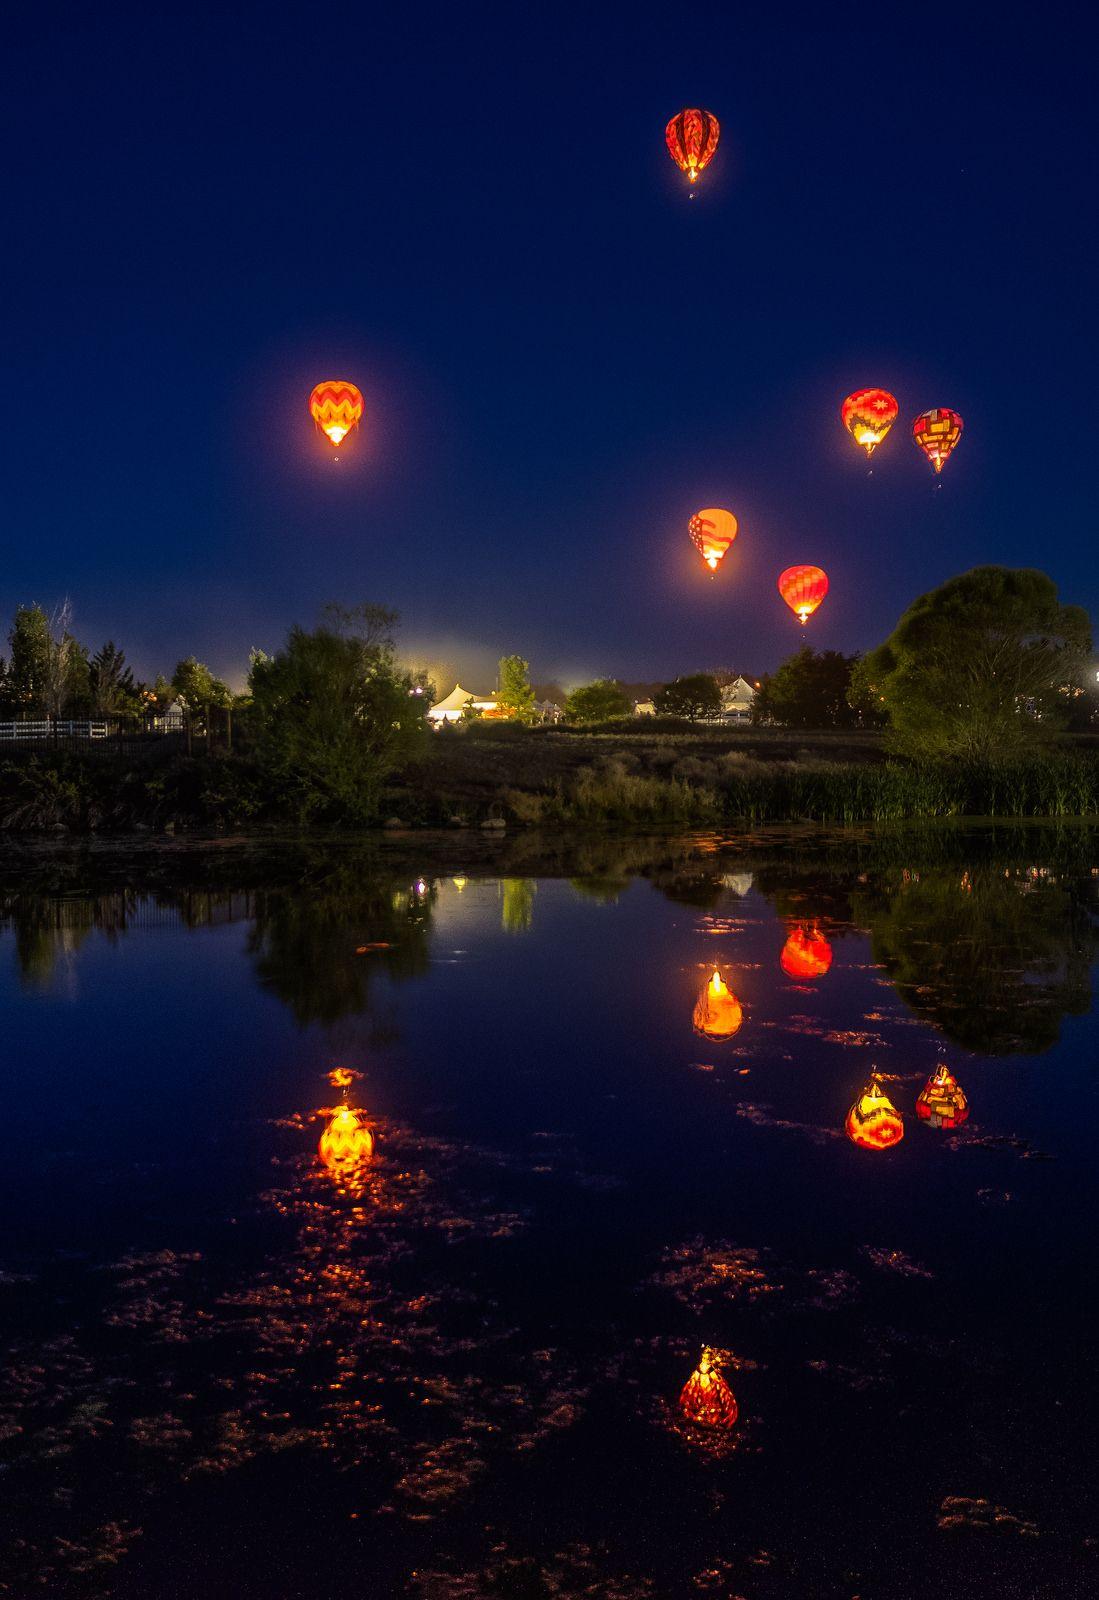 Dawn Patrol at Great Reno Balloon Race Balloon race, Air